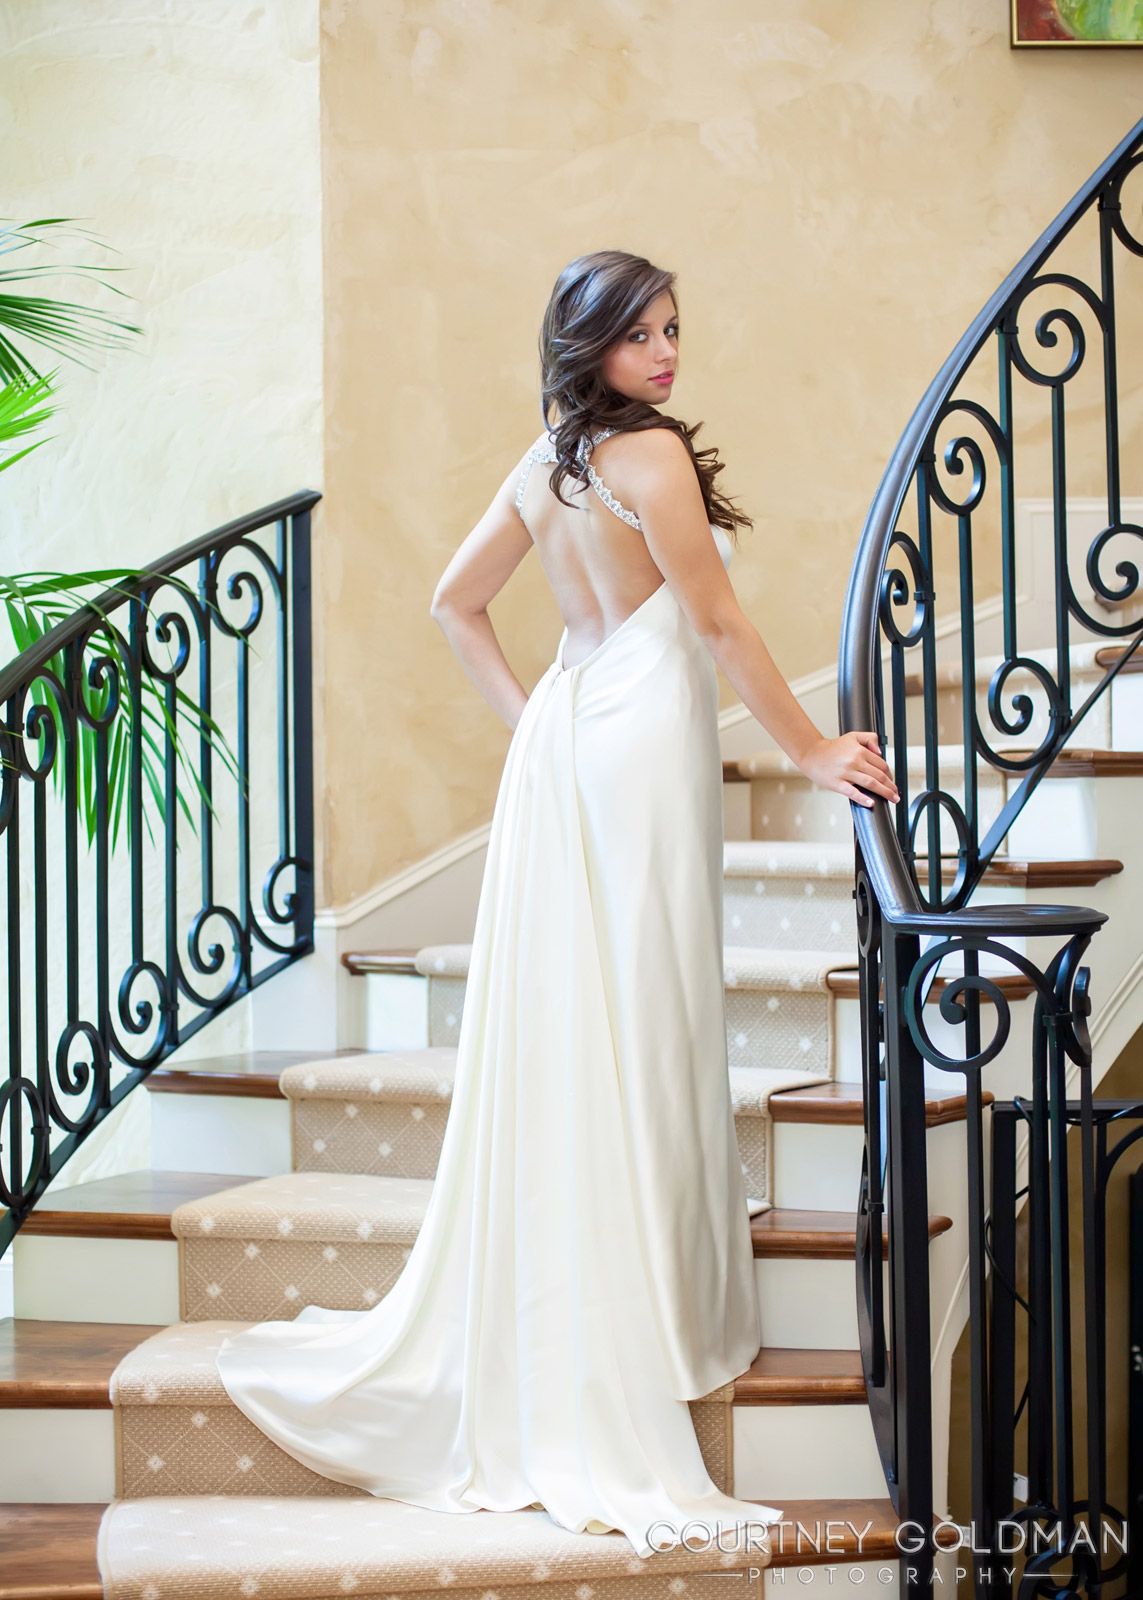 Atlanta-Wedding-Photography-by-Courtney-Goldman-81.jpg